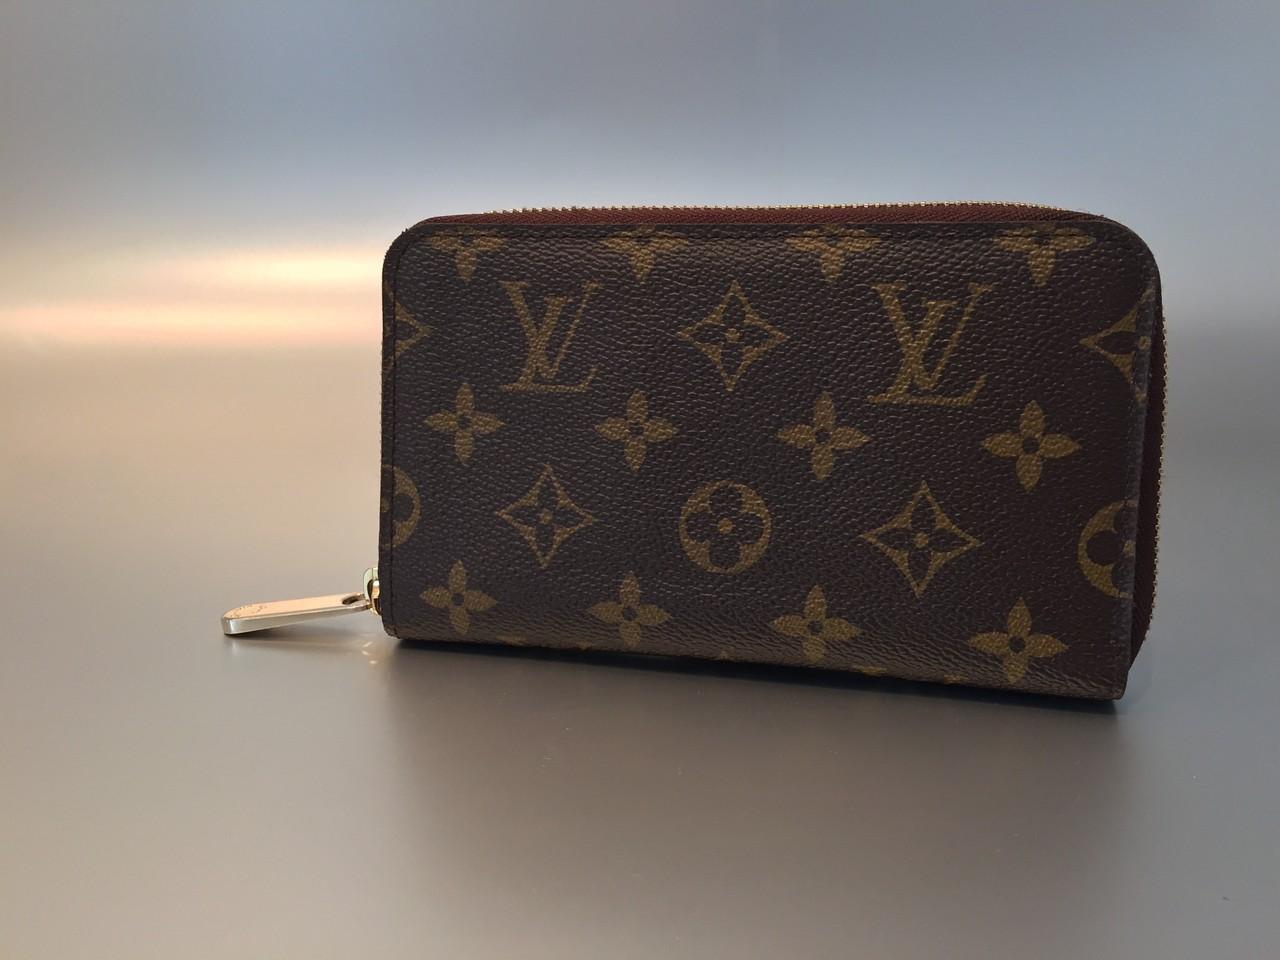 13b3b40103 Louis Vuitton Monogram Canvas Compact Zippy Geldbörse